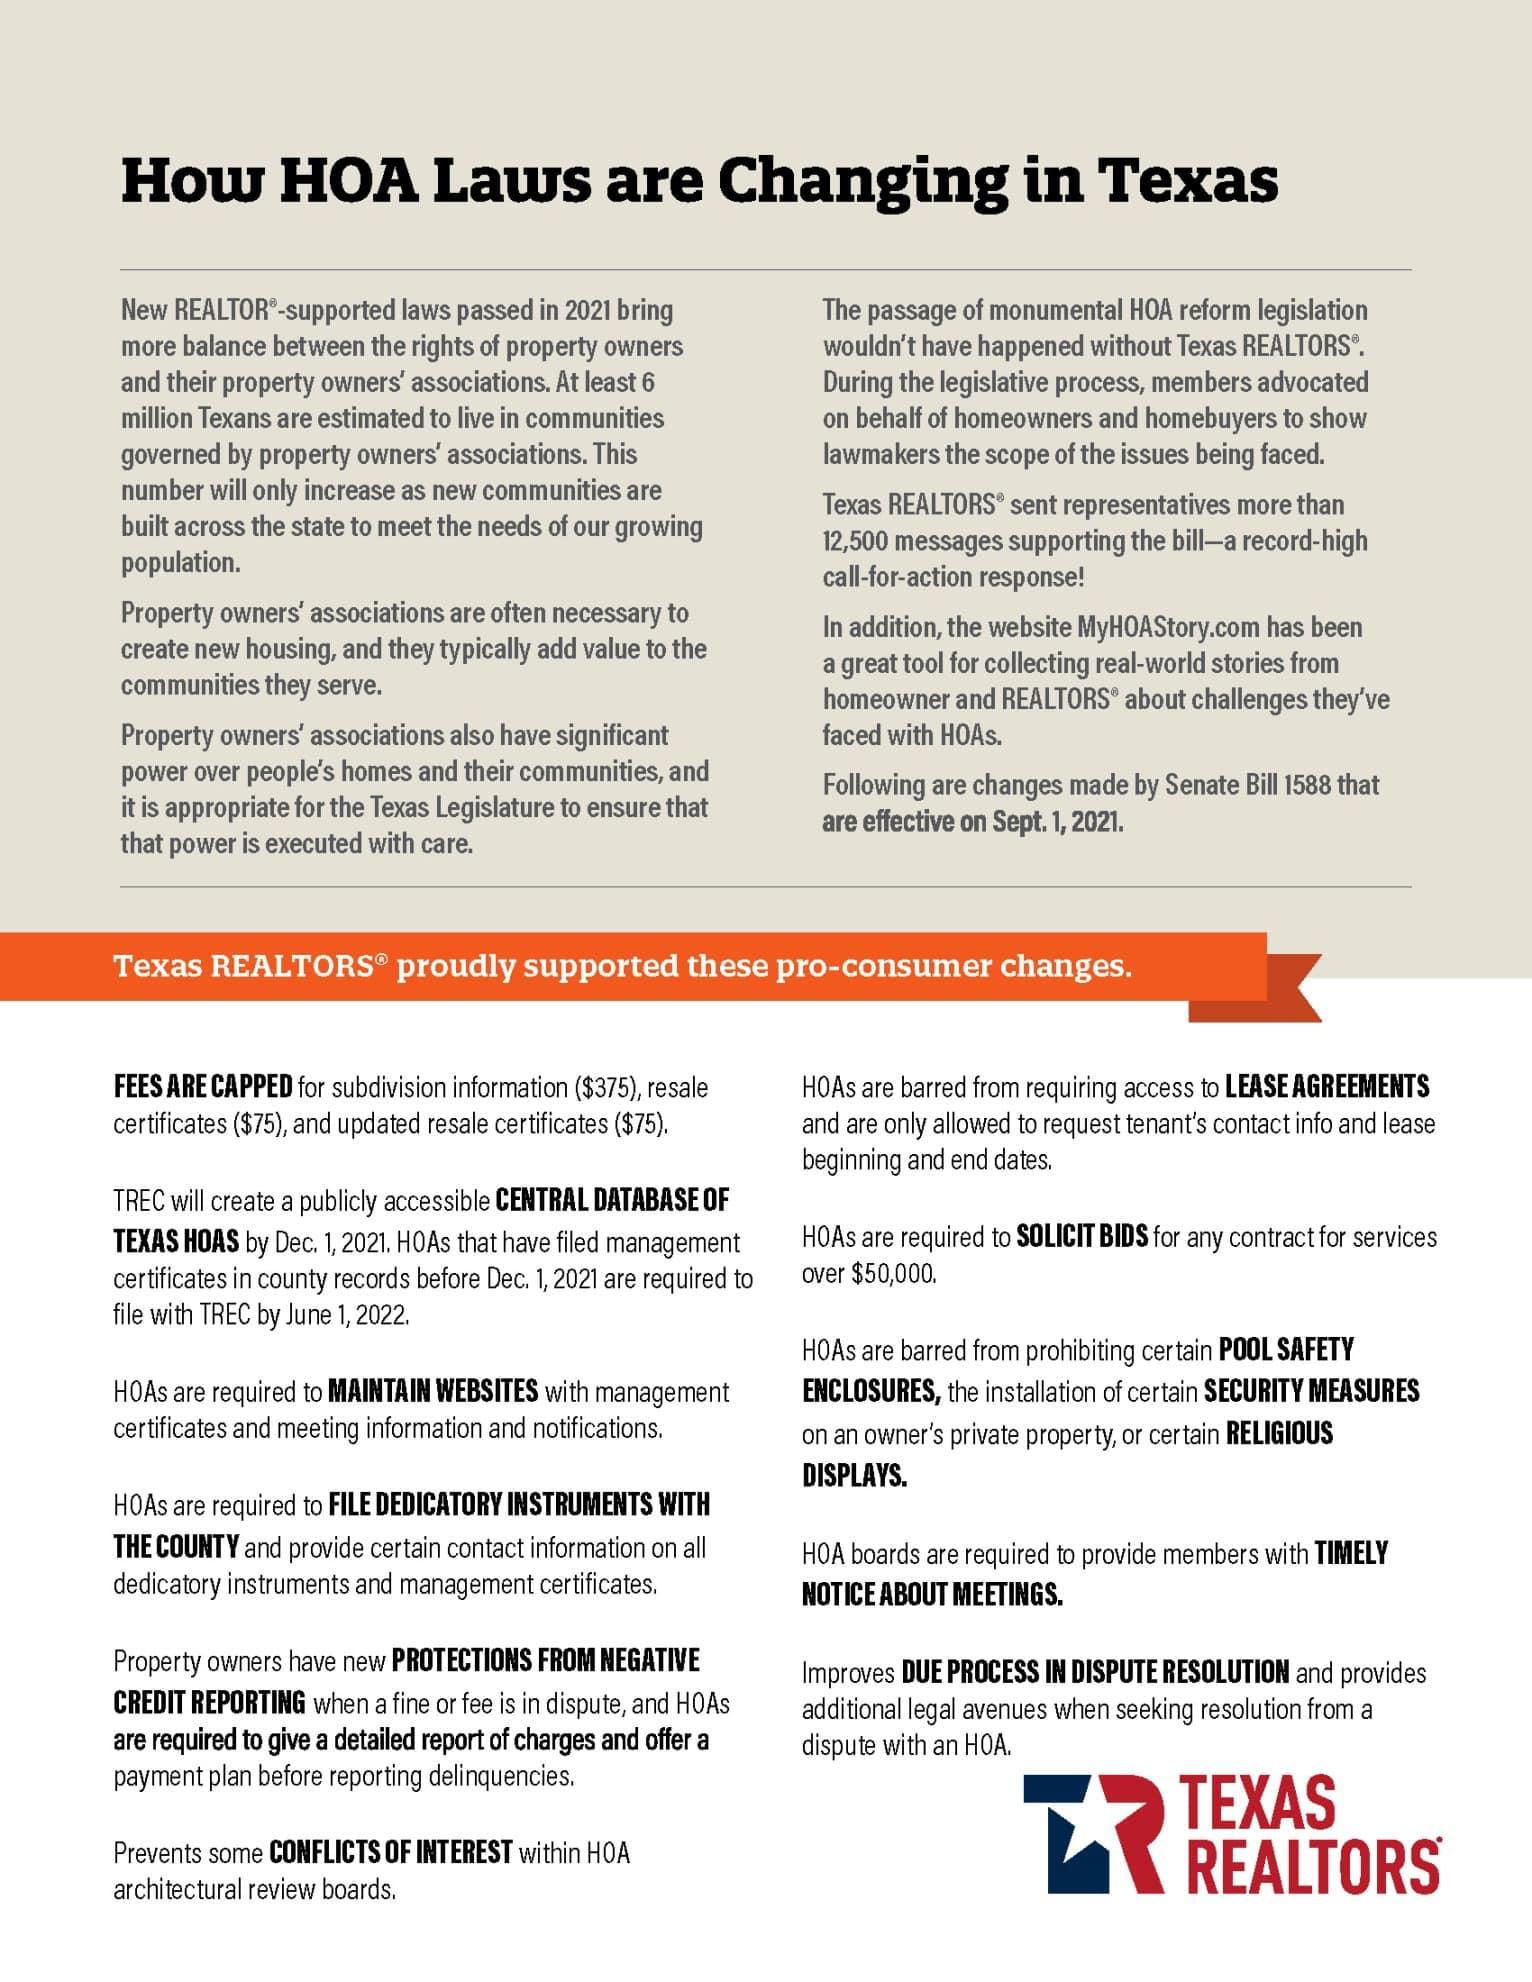 HOA Reforms list